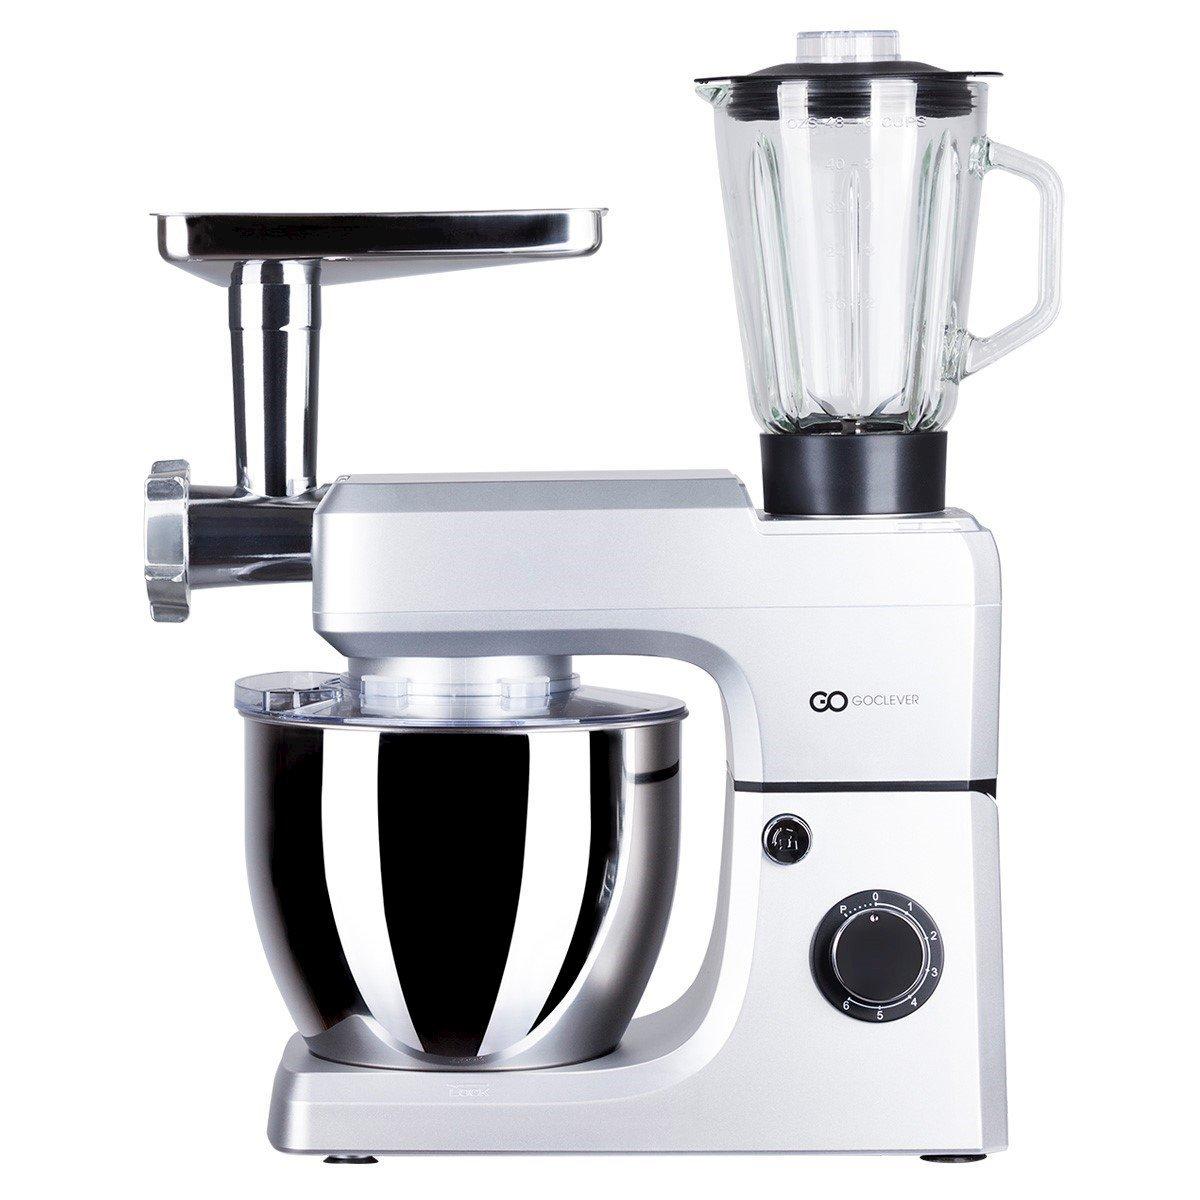 GO CLEVER hkitchr Robot de cocina Watts, 1200 W, 6.5 liters: Amazon.es: Hogar